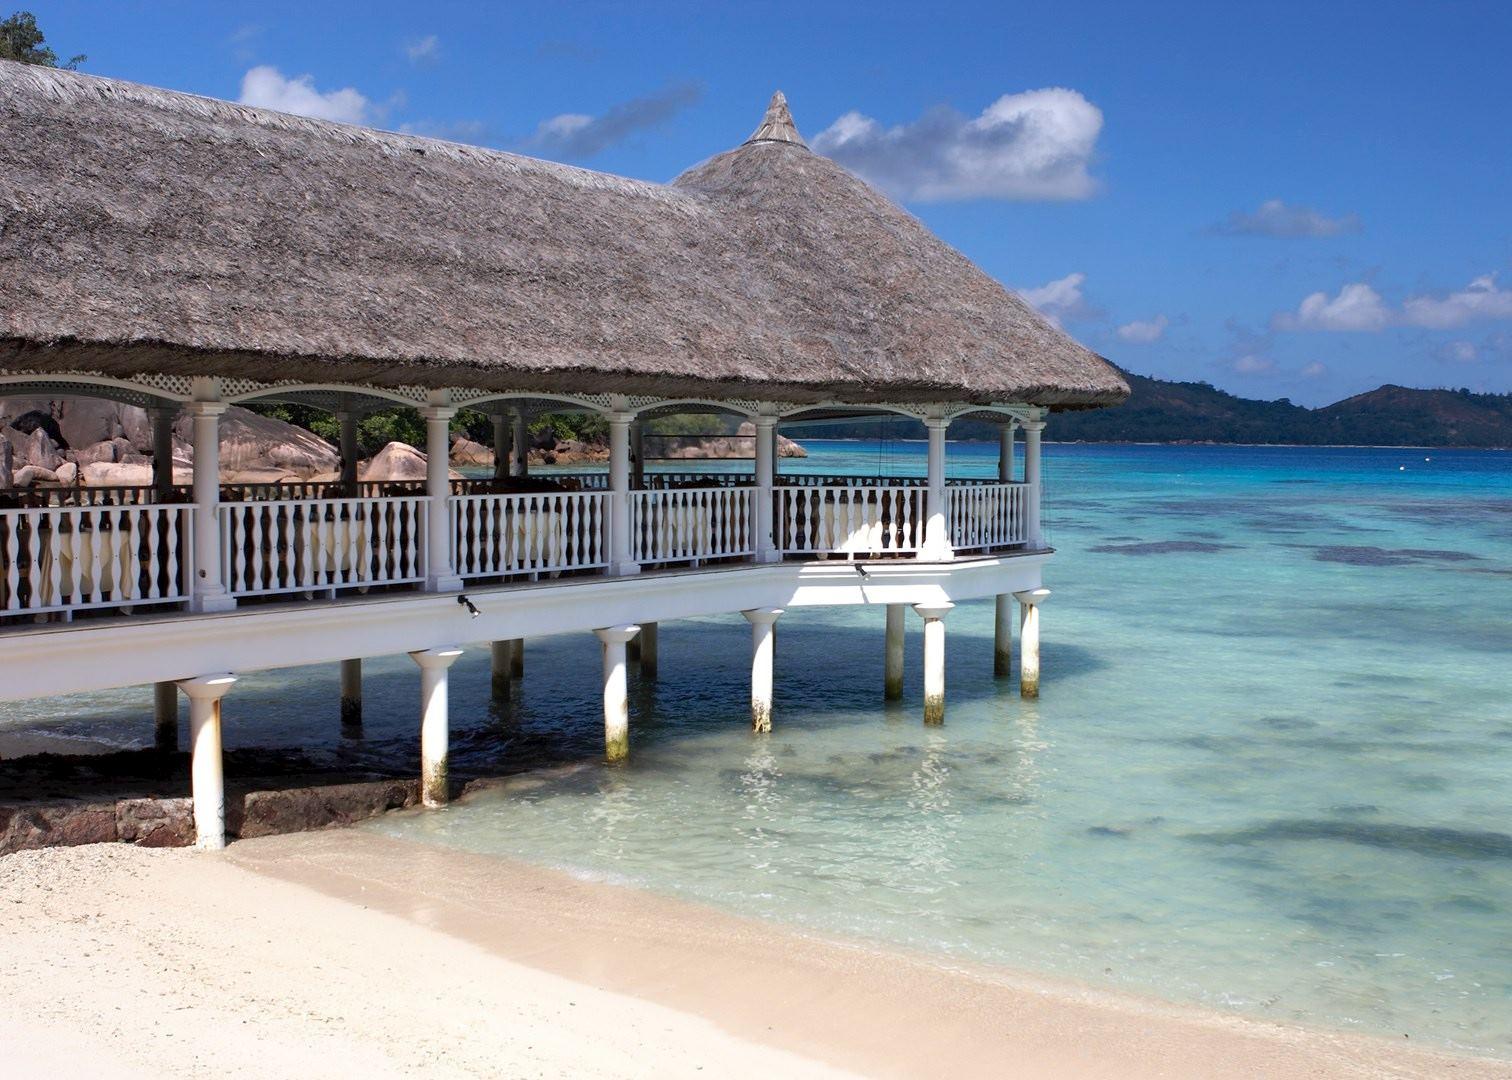 Le domaine de la reserve praslin hotels audley travel for Reserver des hotels